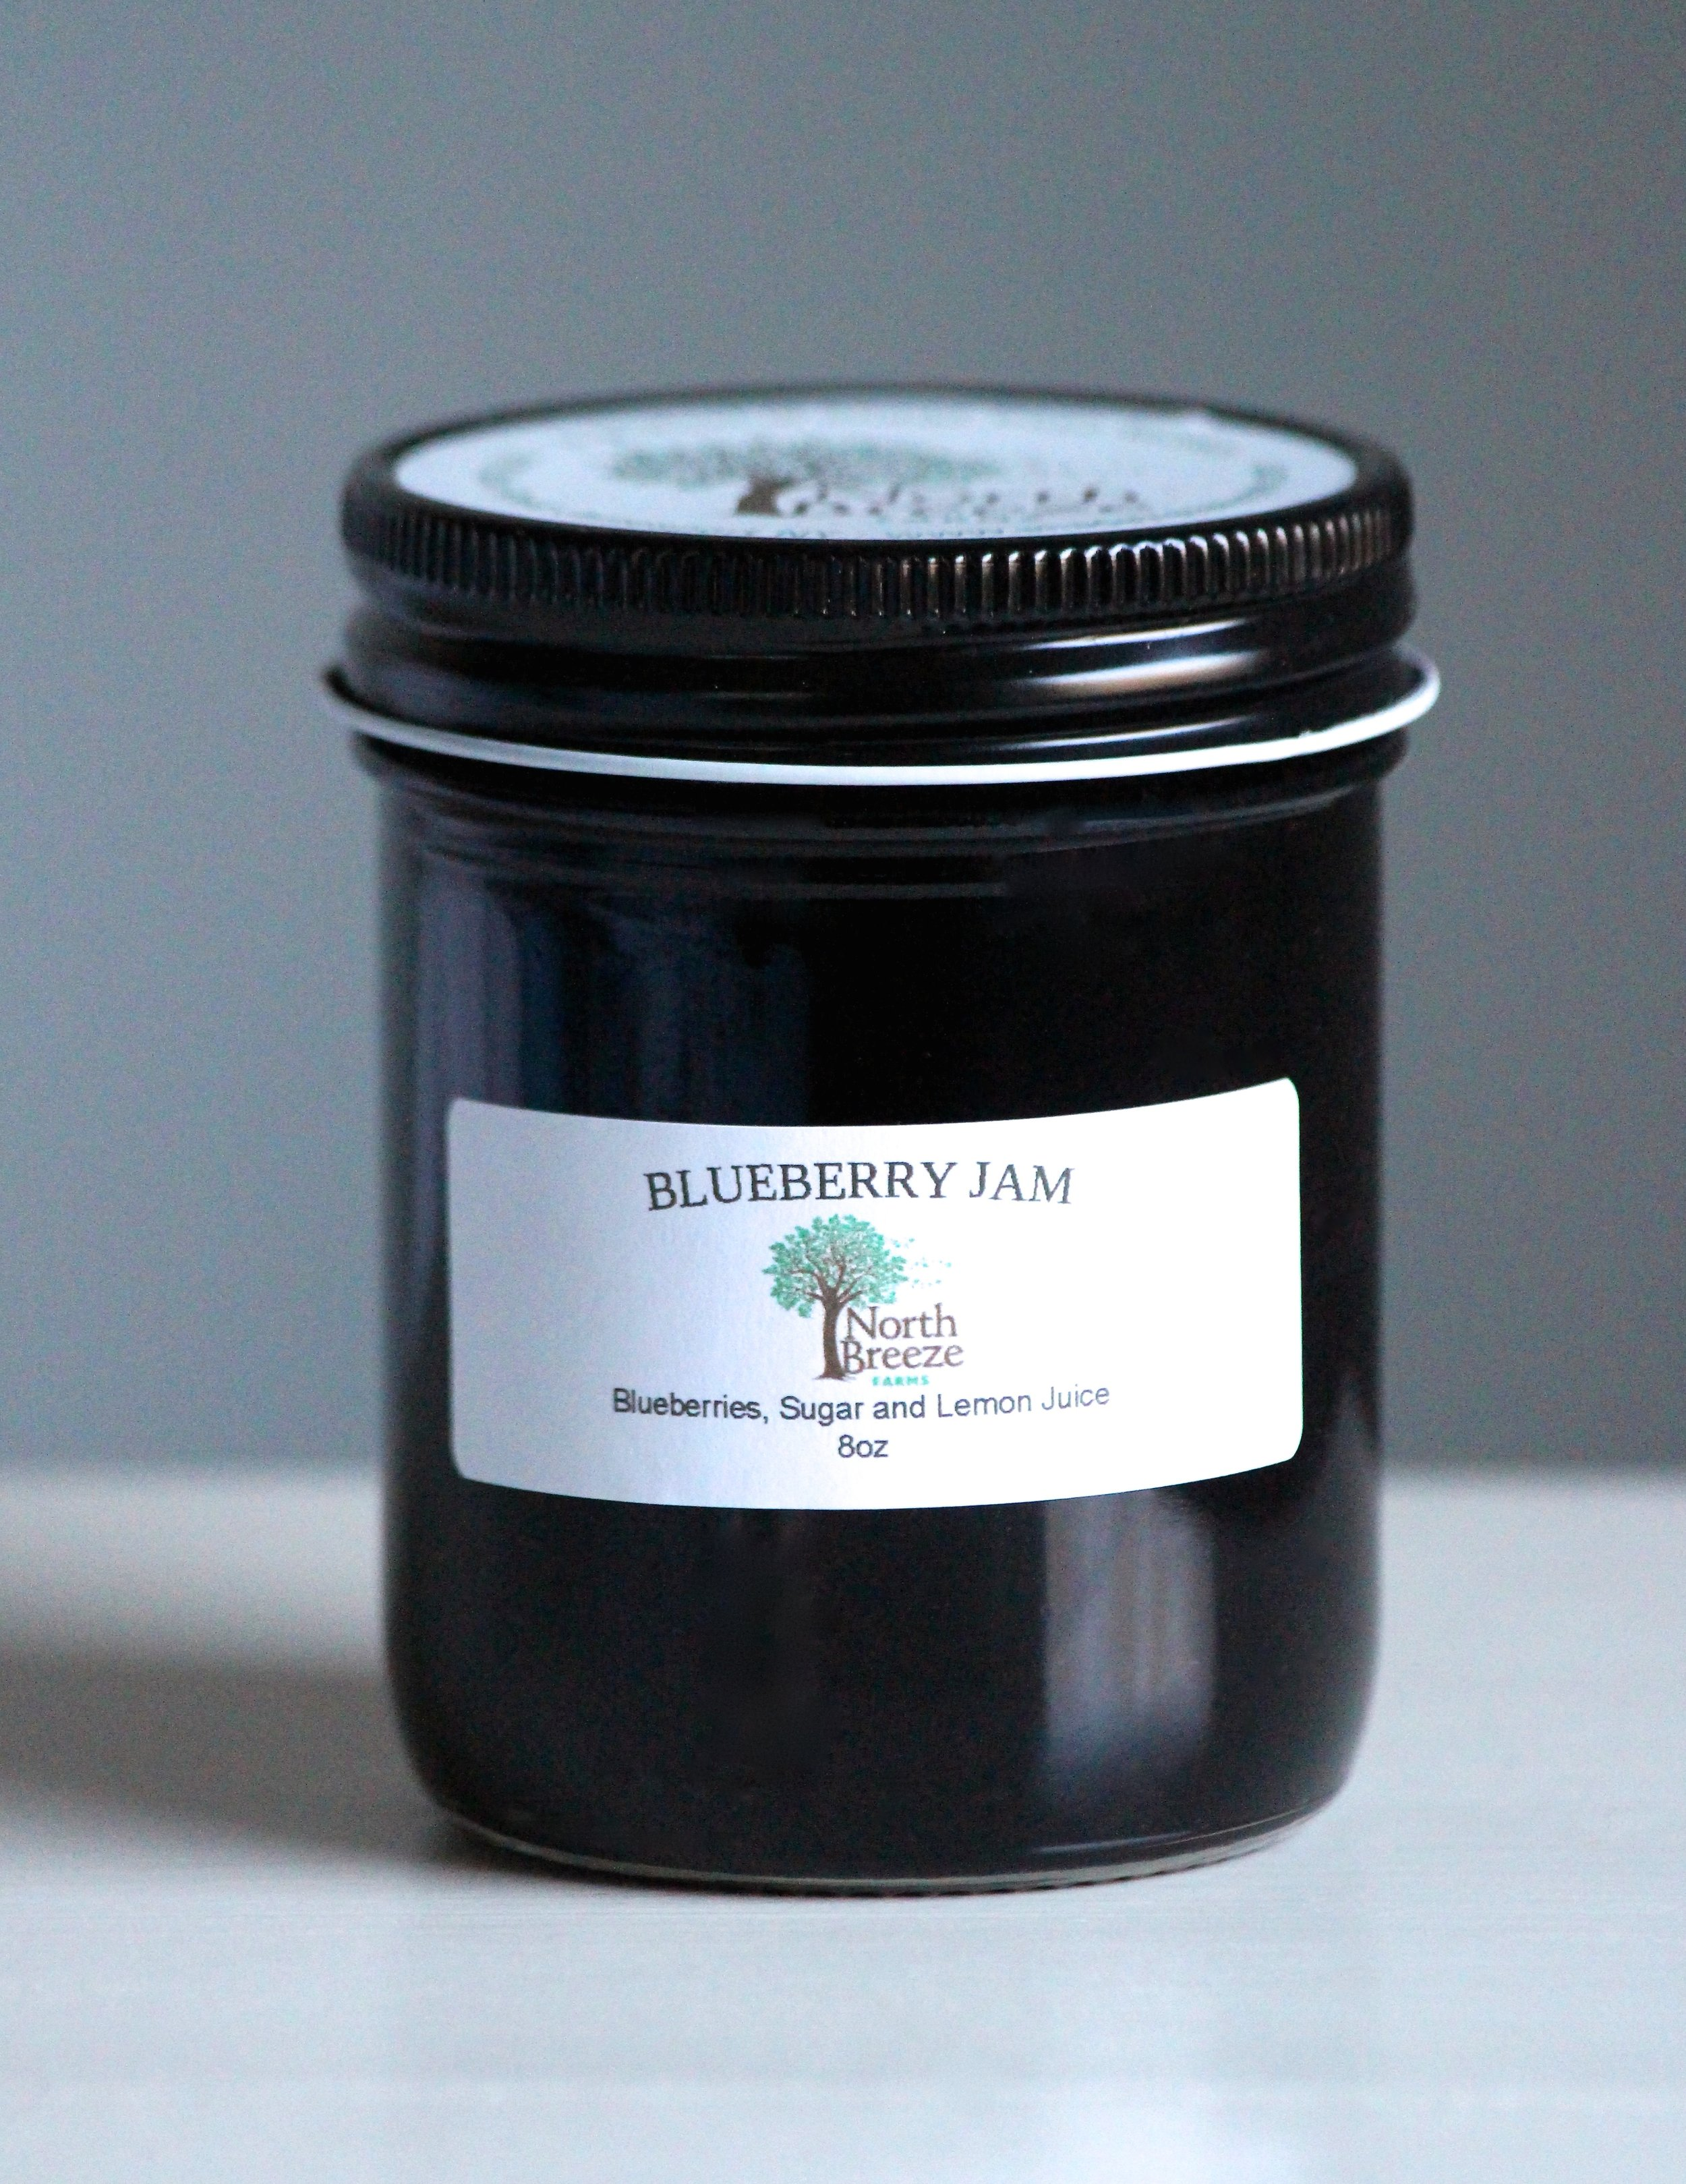 Blueberry Jam $12